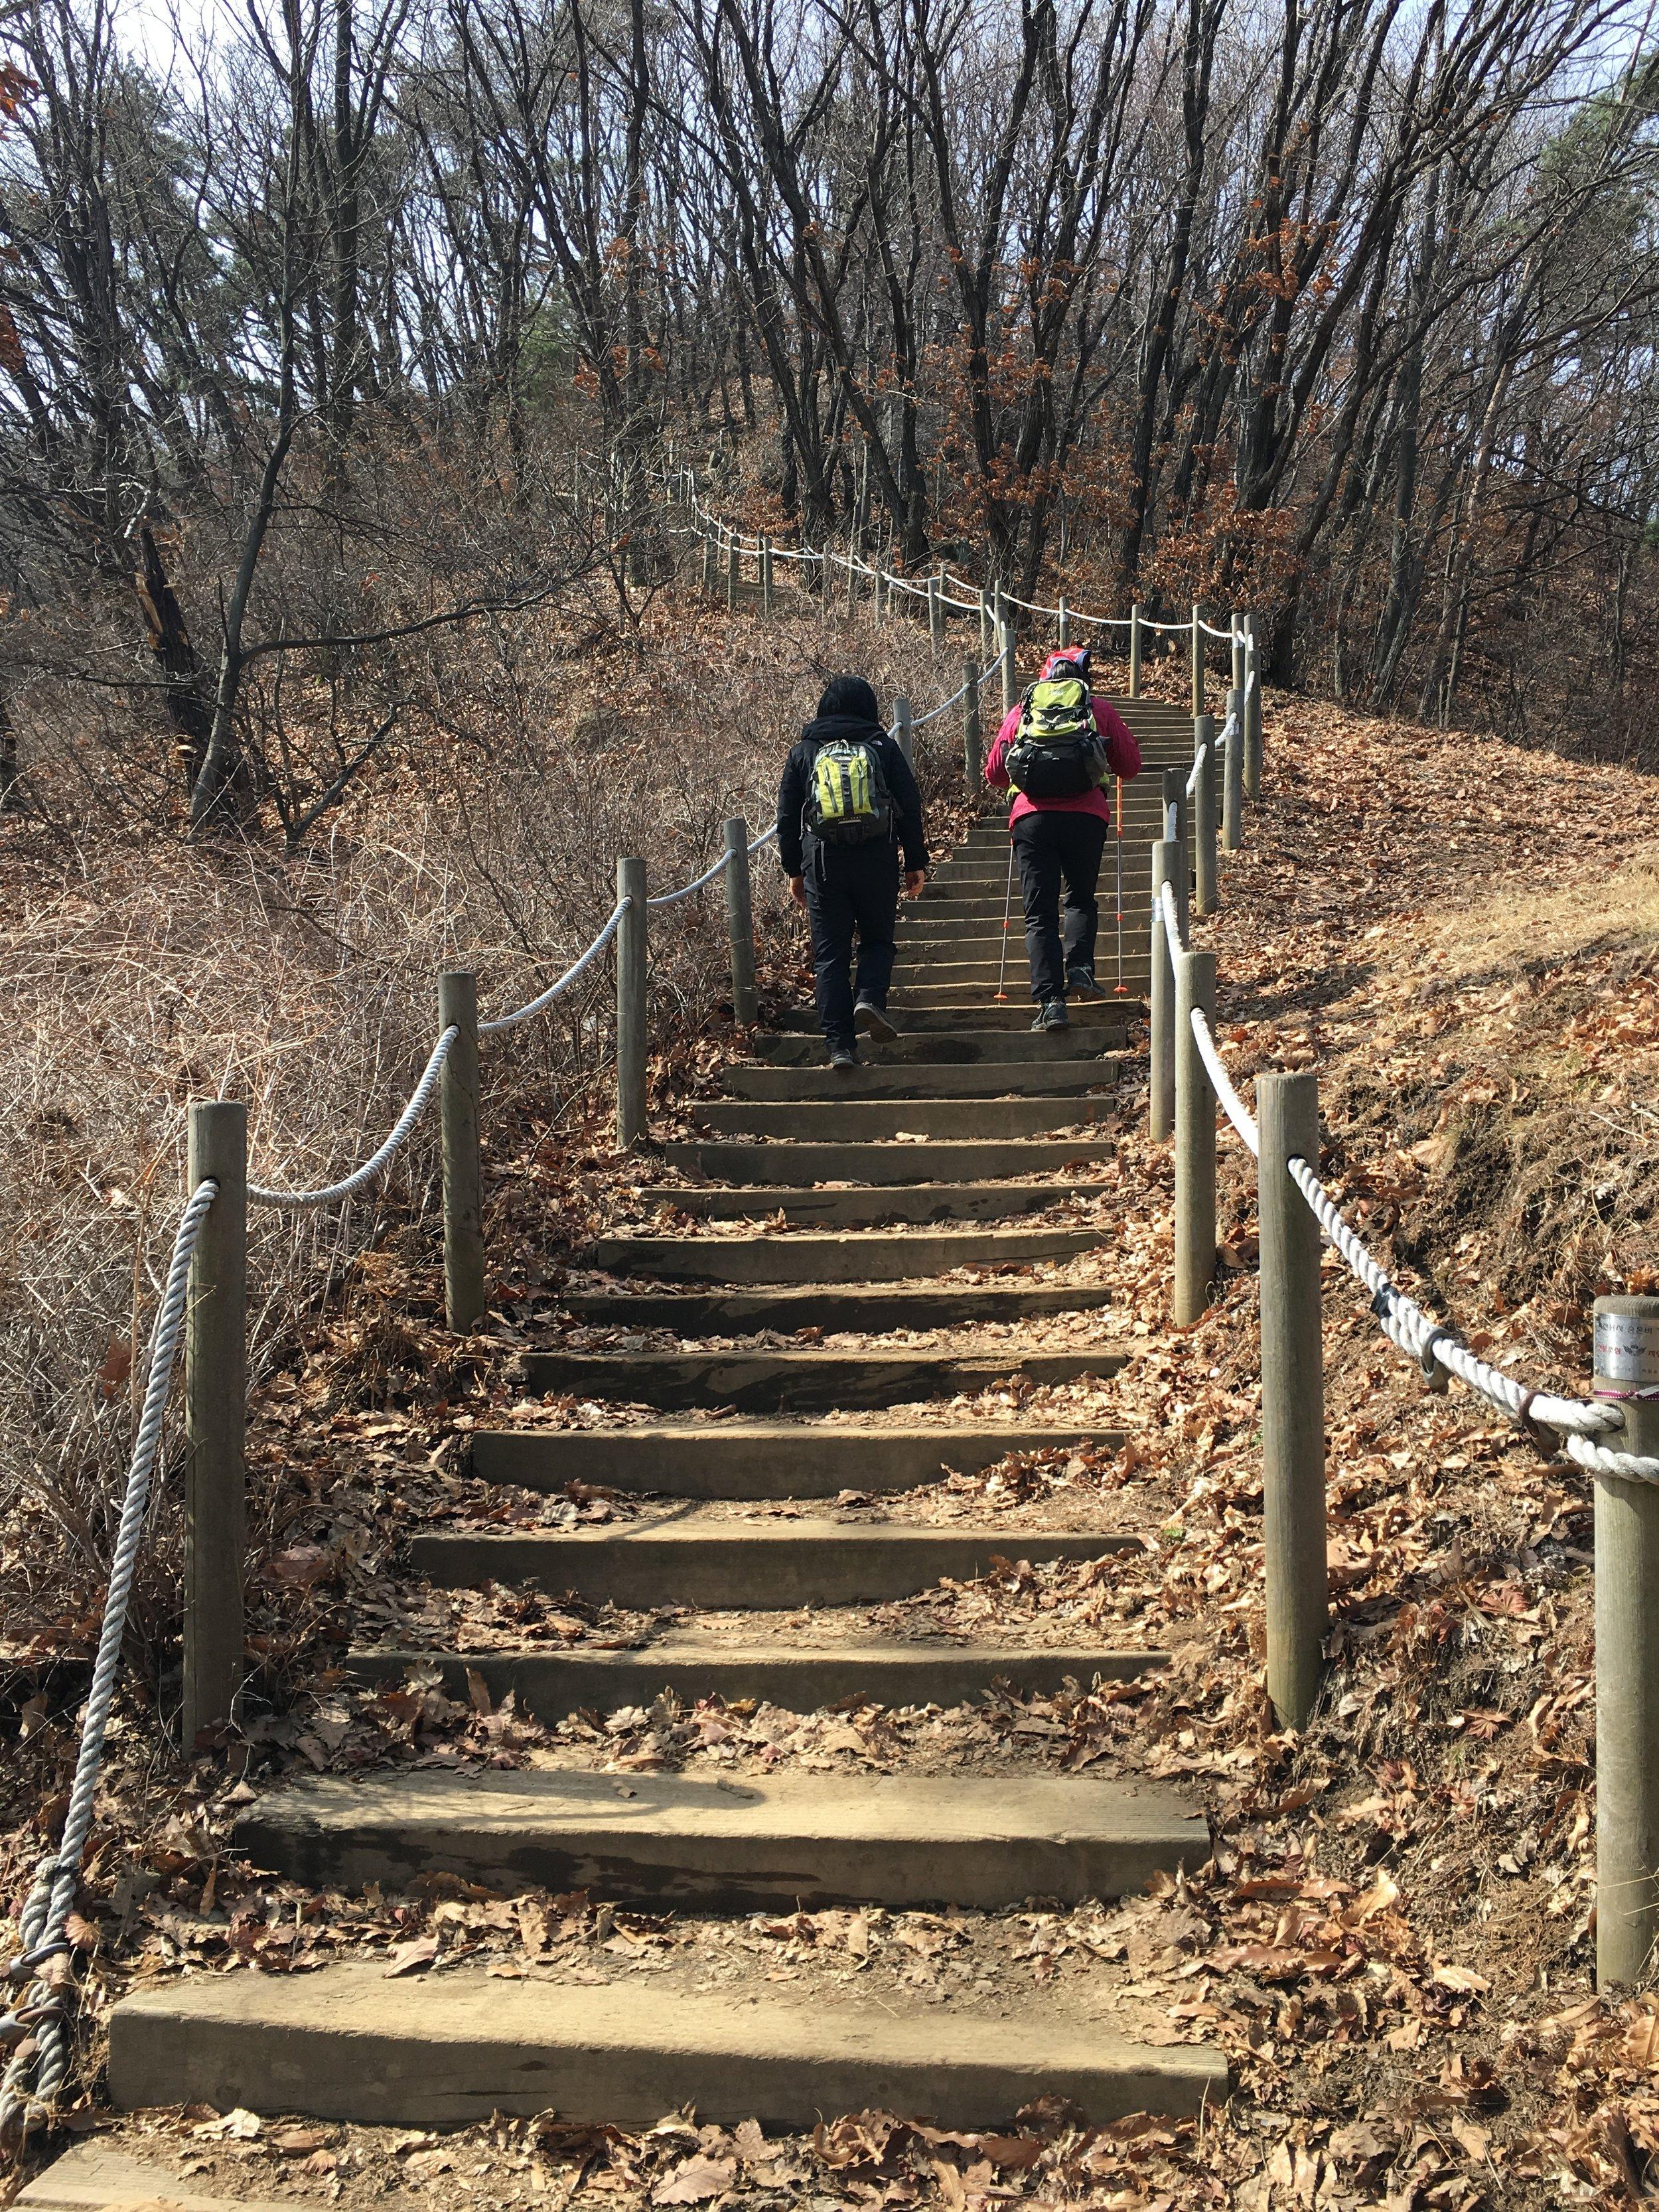 How to Hike Like a Korean